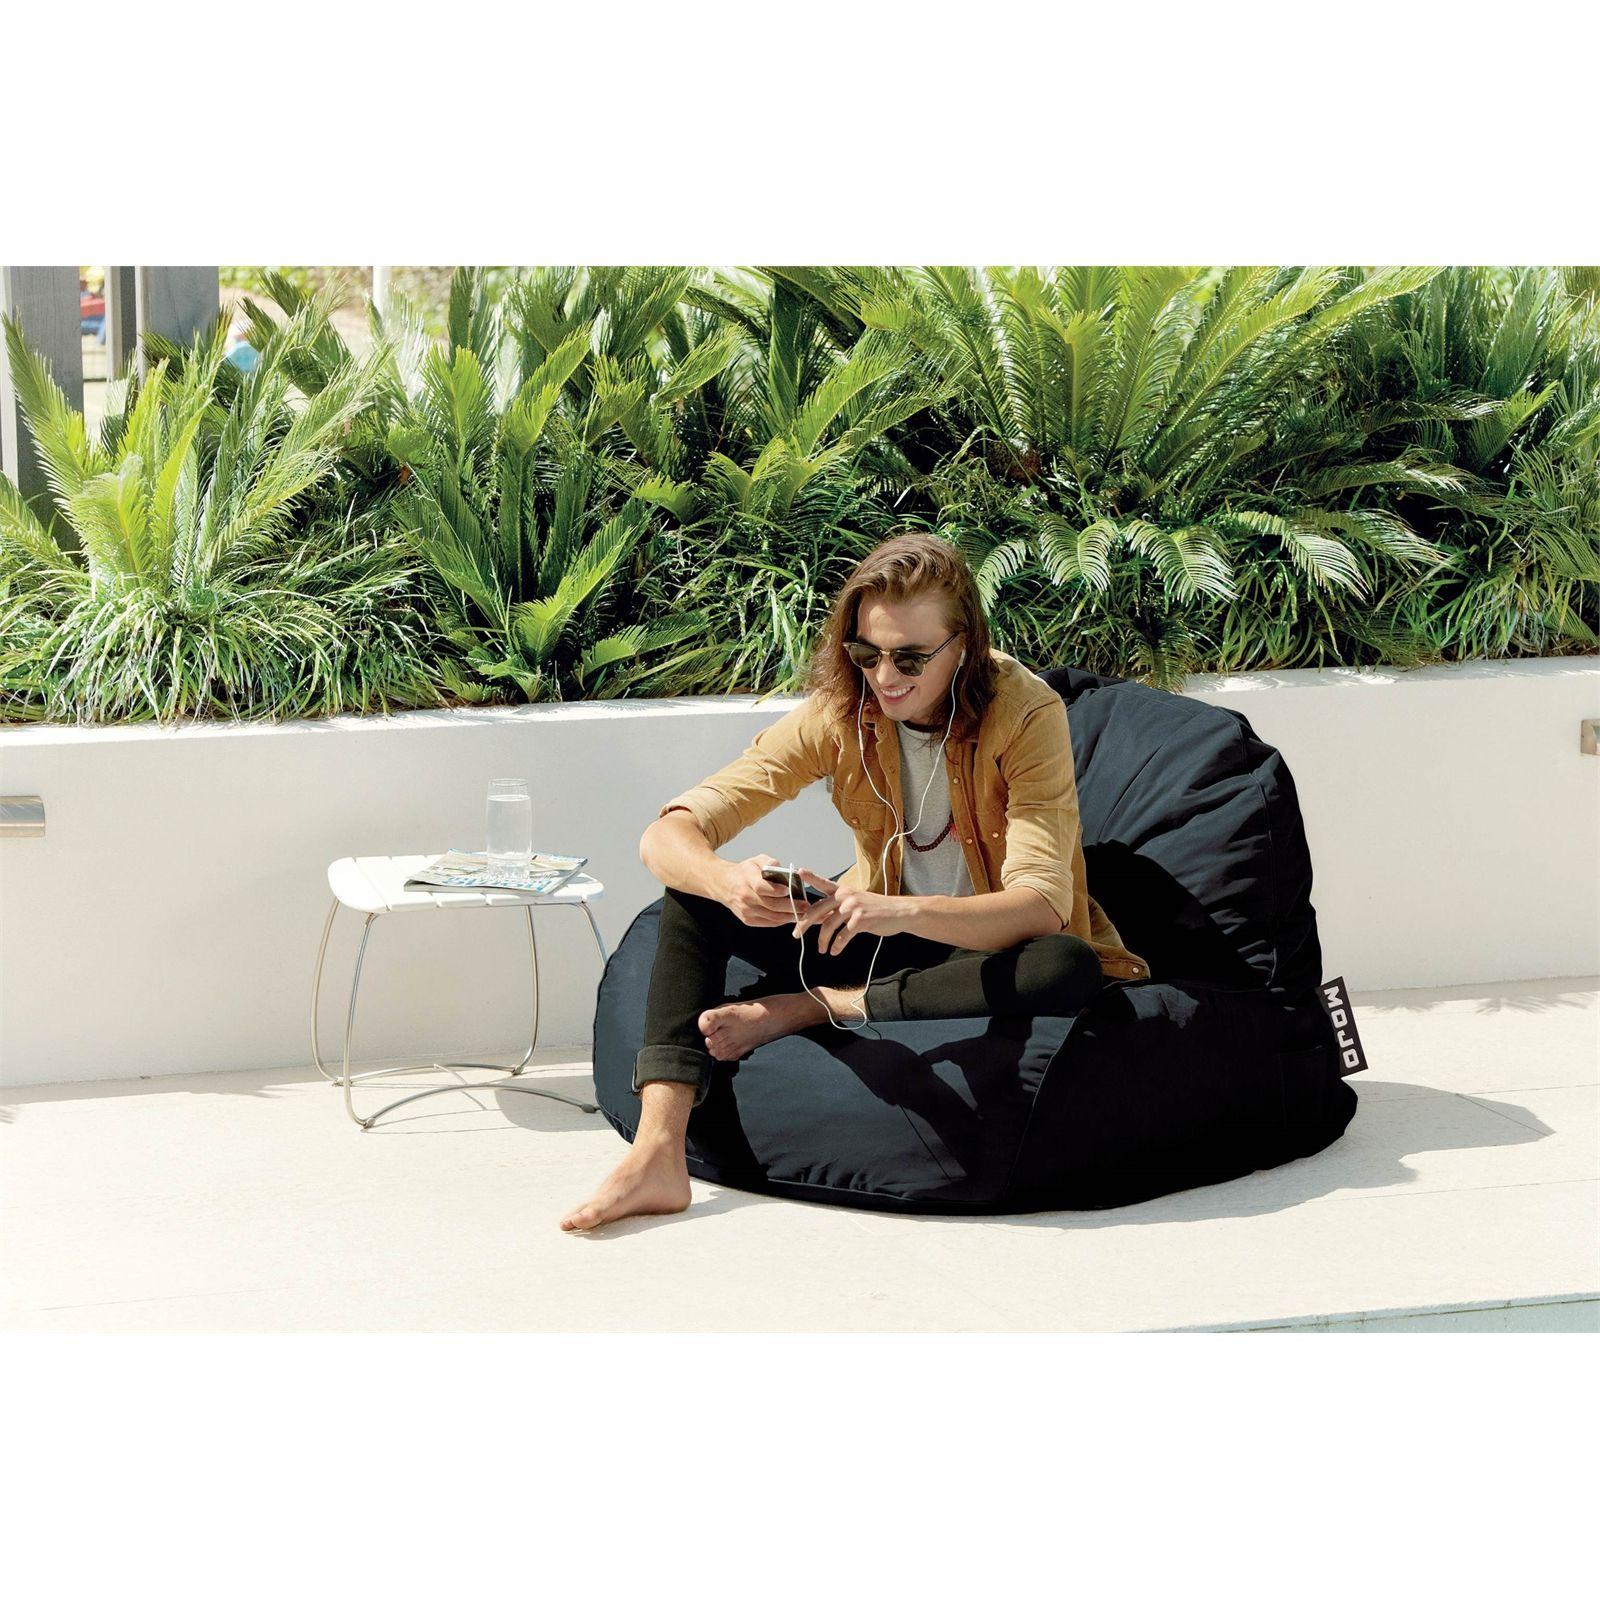 Mojo Black MyChair Outdoor Cushion Outdoor cushions